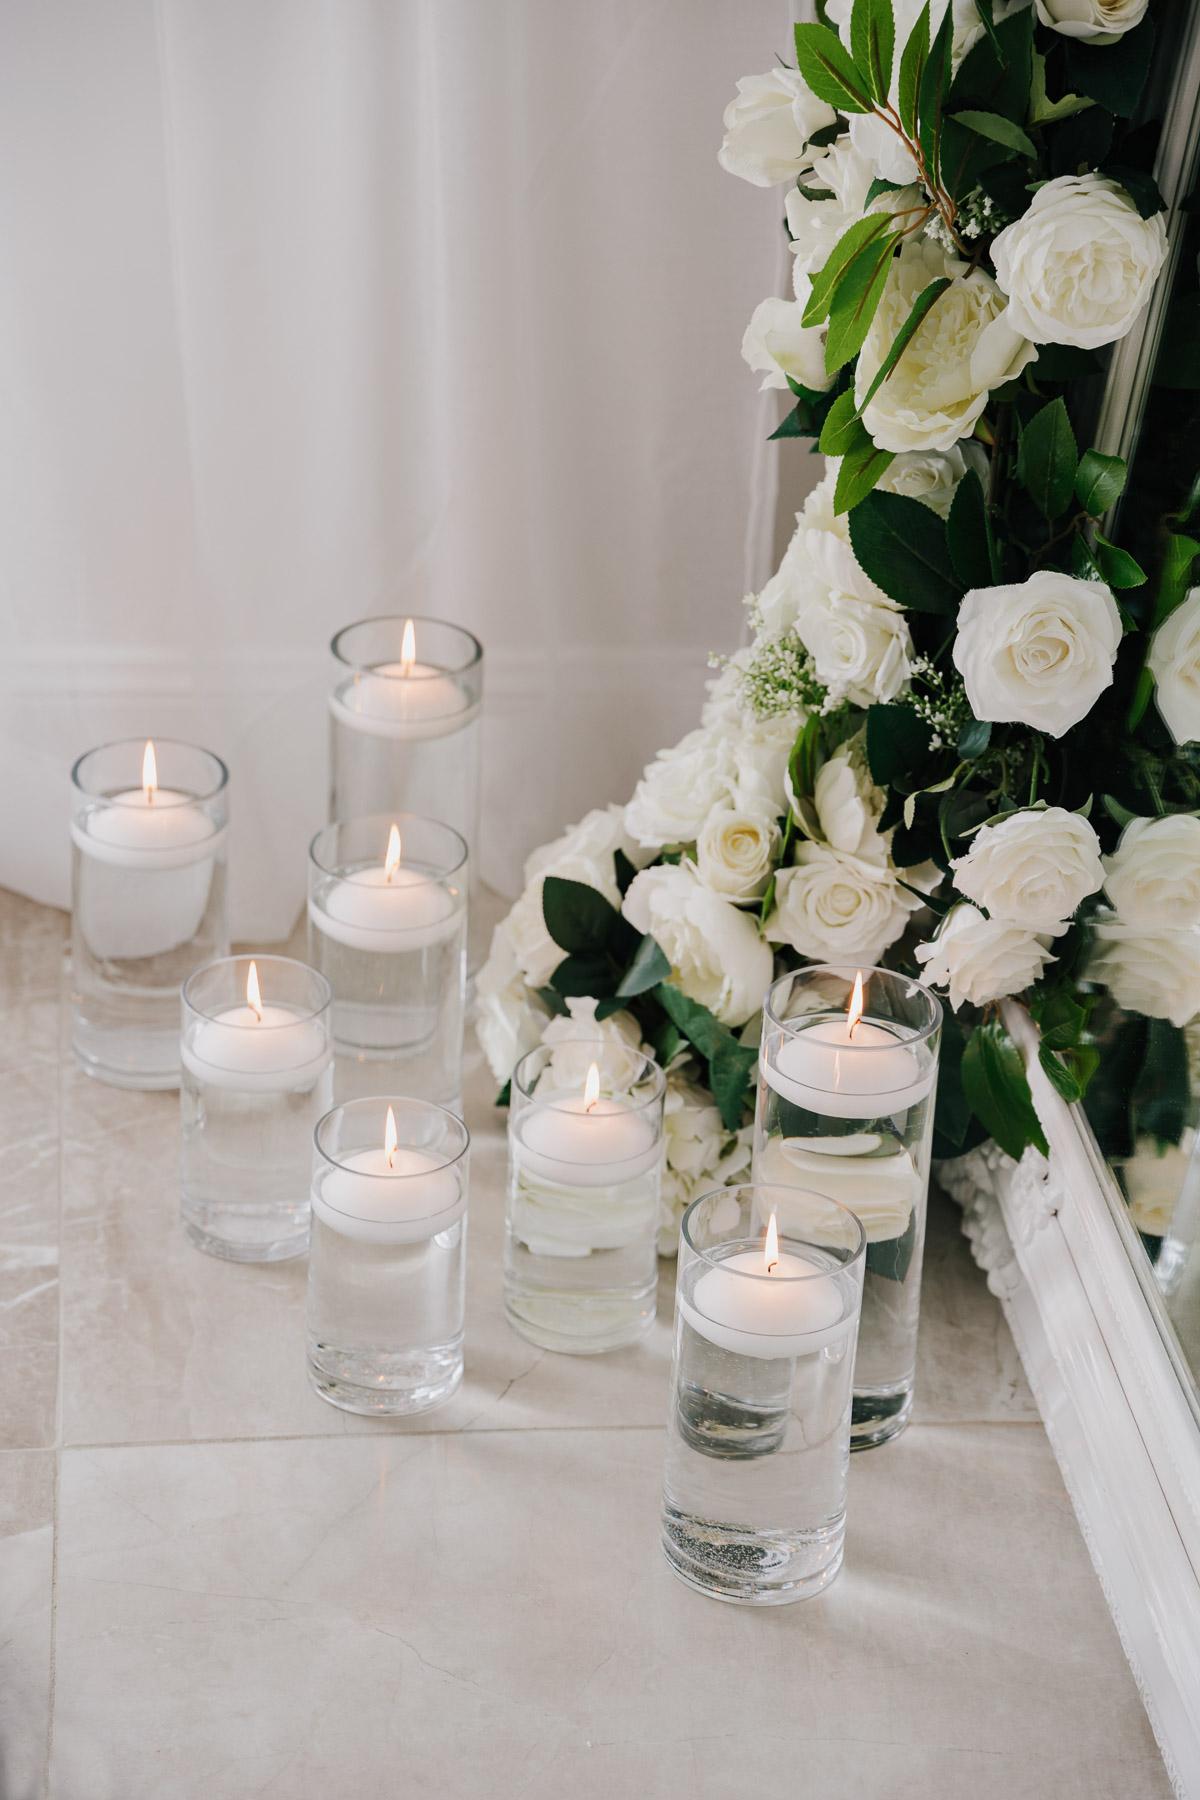 Le Montage Wedding - Jessica & Mark 2